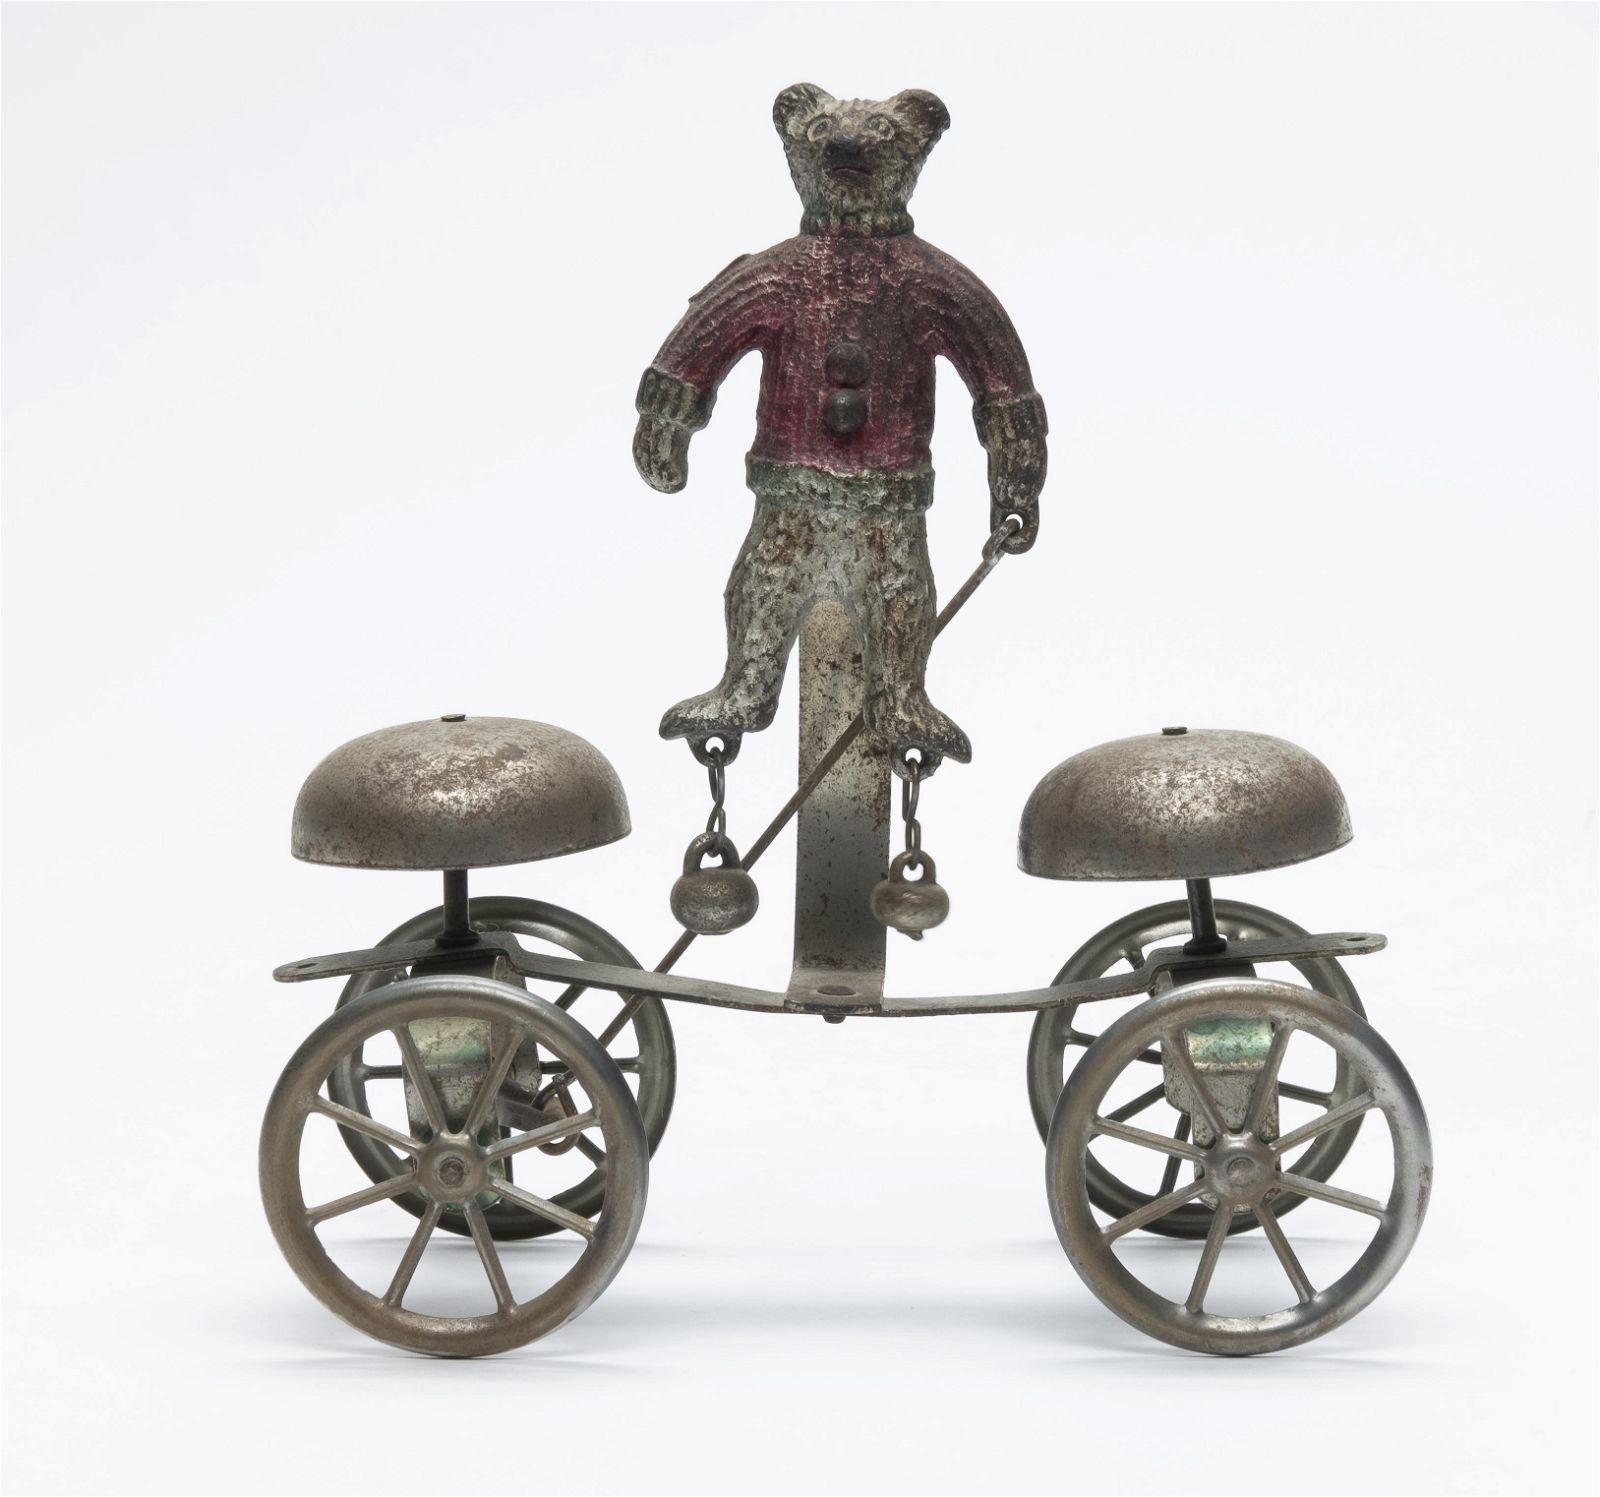 Gong Bell Single Teddy Bear Bell Toy